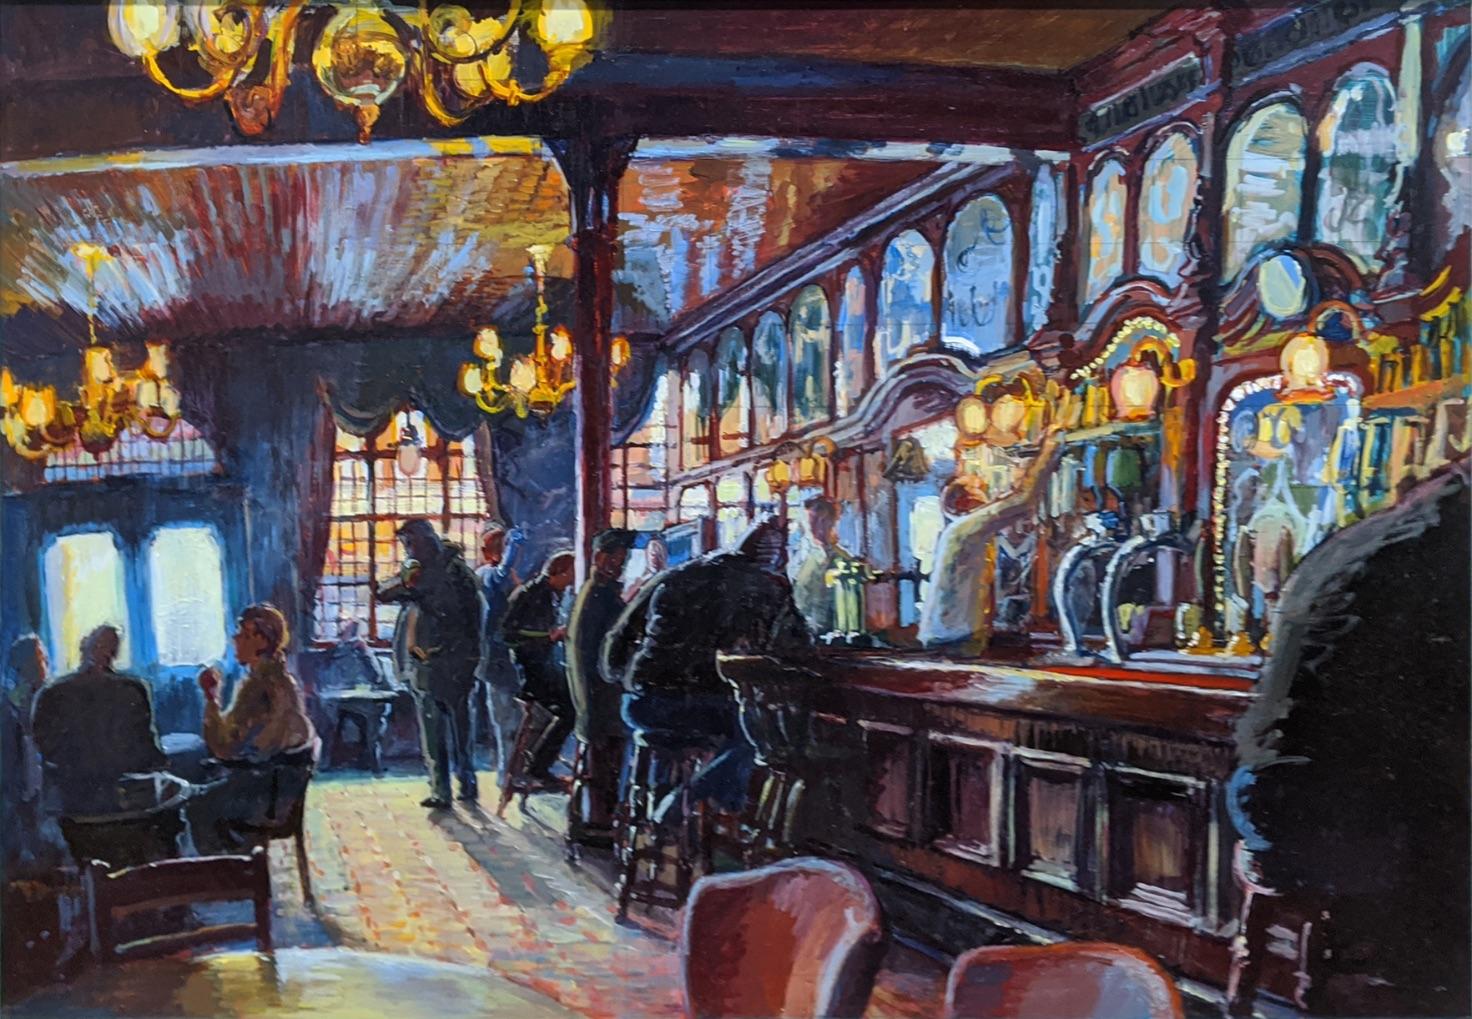 Gary Jeffrey (Contemporary British), The Spread Eagle Pub, Wandsworth, oil on board, H.66cm W.86.5cm